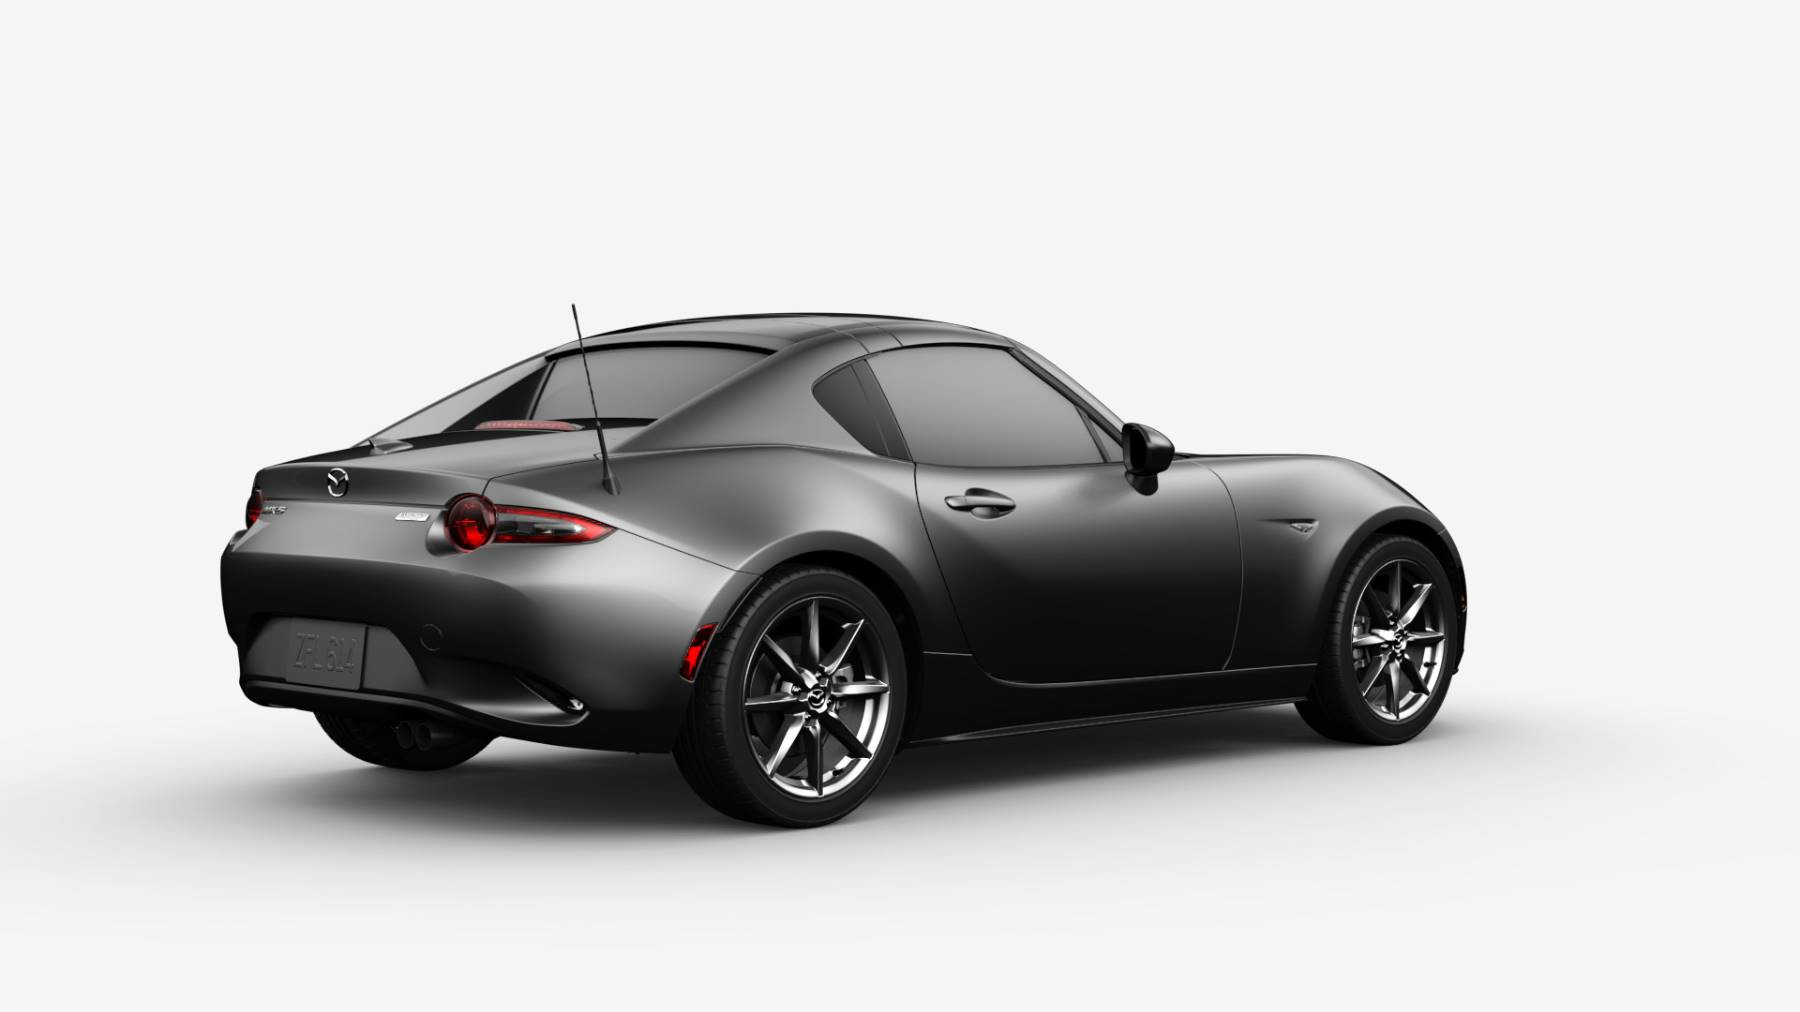 2017 mazda mx-5 miata rf hard top convertible | mazda usa